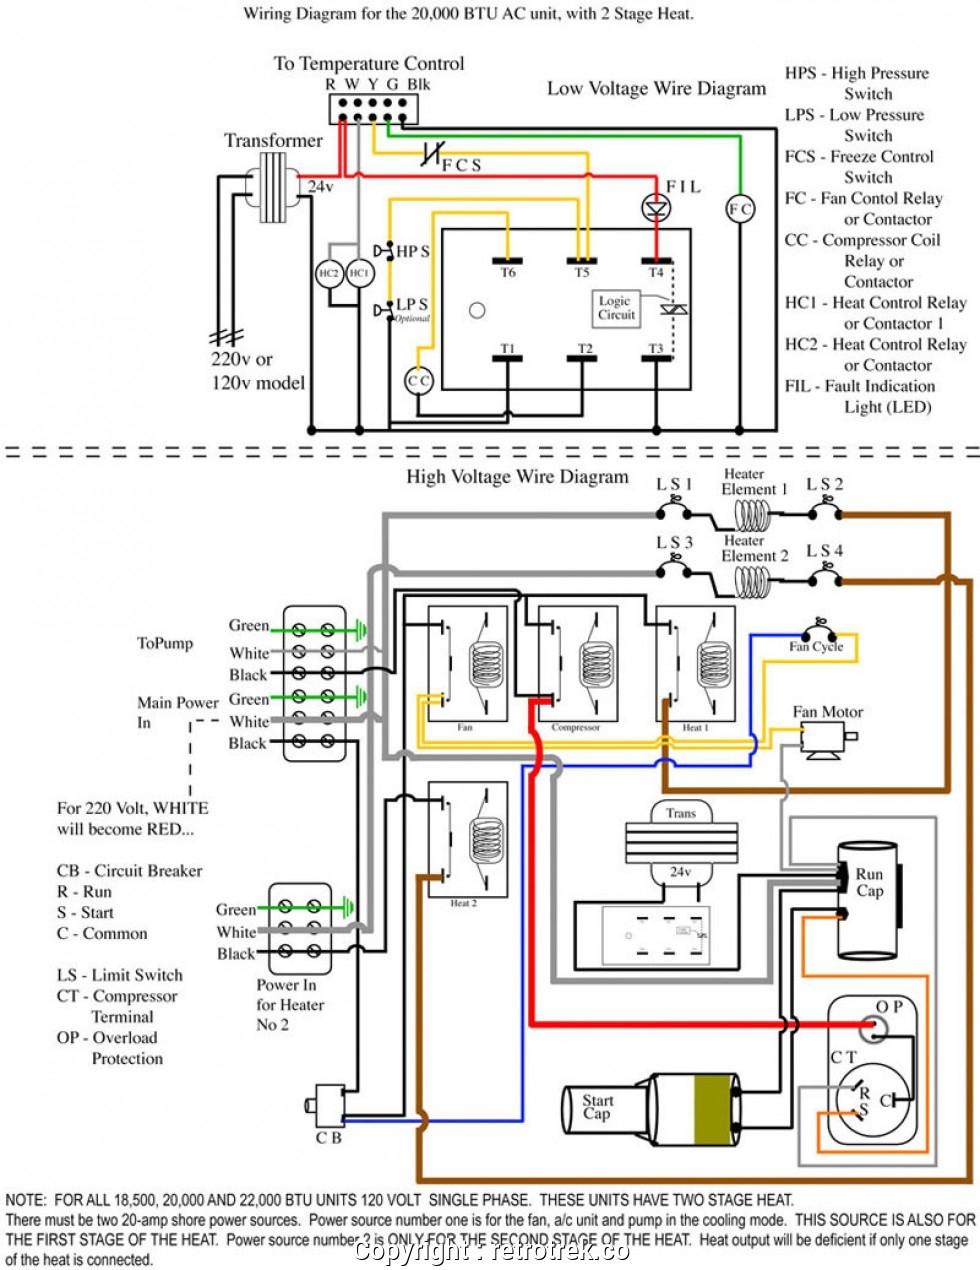 Wiring Diagram For Coleman Heat Pump | Wiring Diagram - Heat Pump Thermostat Wiring Diagram